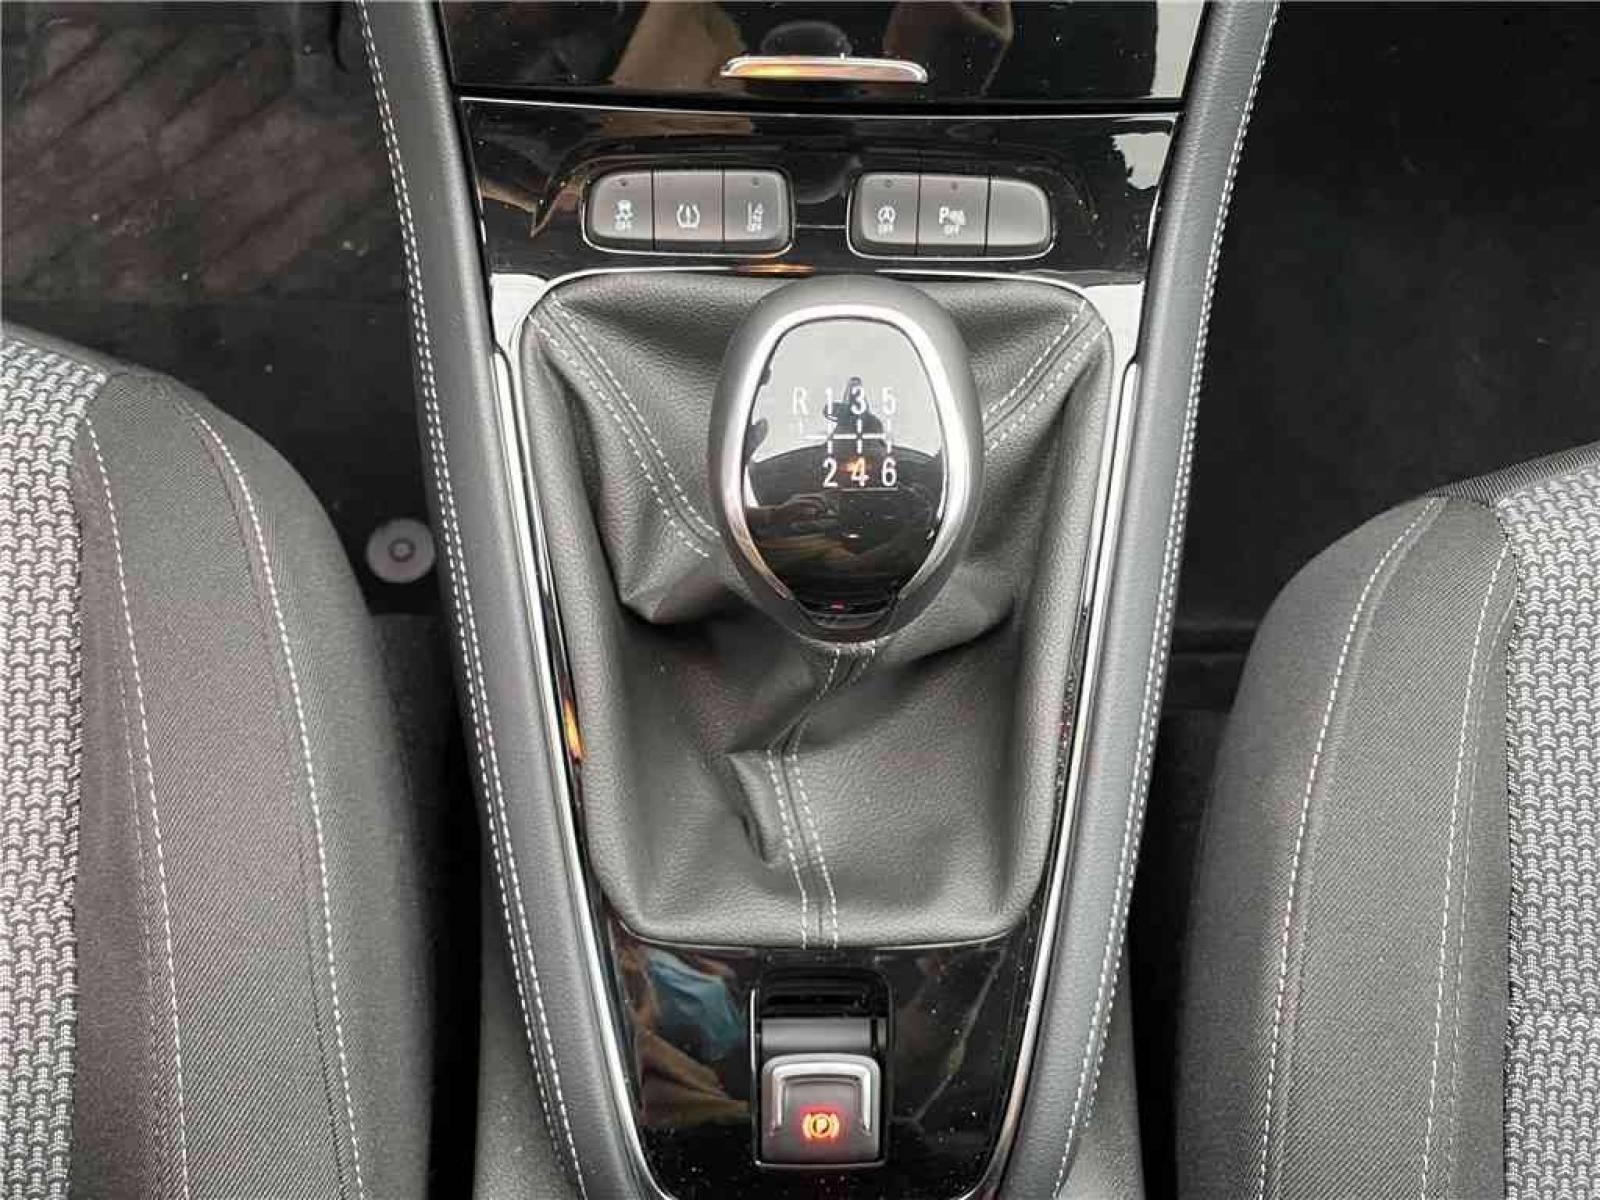 OPEL Grandland X 1.2 Turbo 130 ch - véhicule d'occasion - Groupe Guillet - Opel Magicauto - Chalon-sur-Saône - 71380 - Saint-Marcel - 18